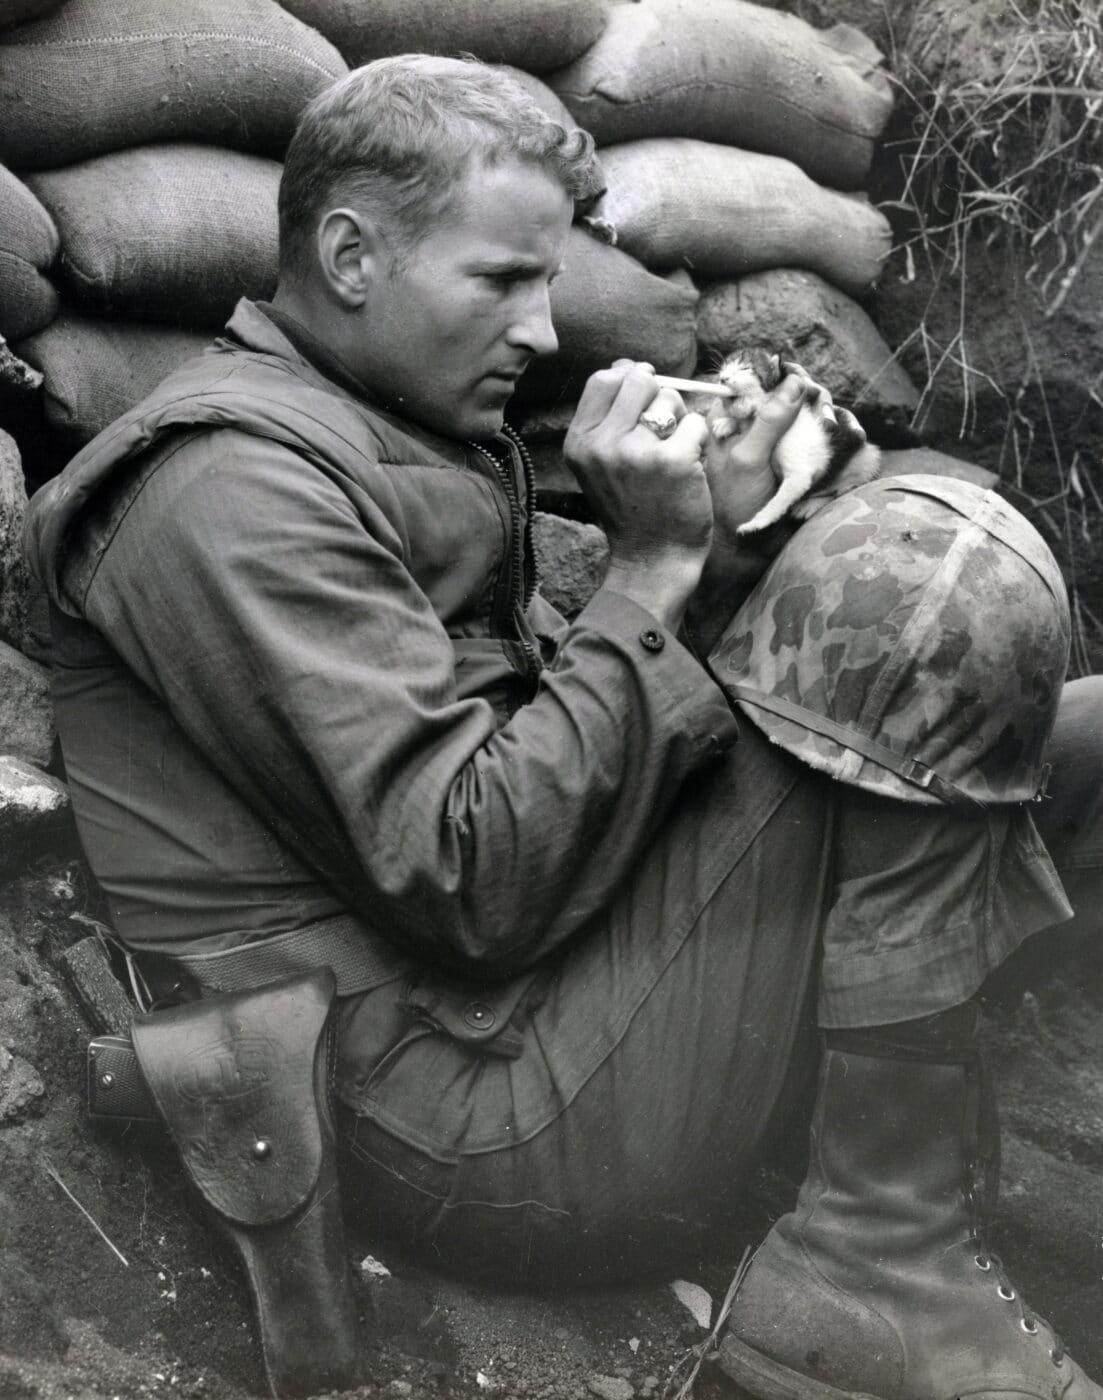 Kitten being fed by U.S. Marine in the Korean War